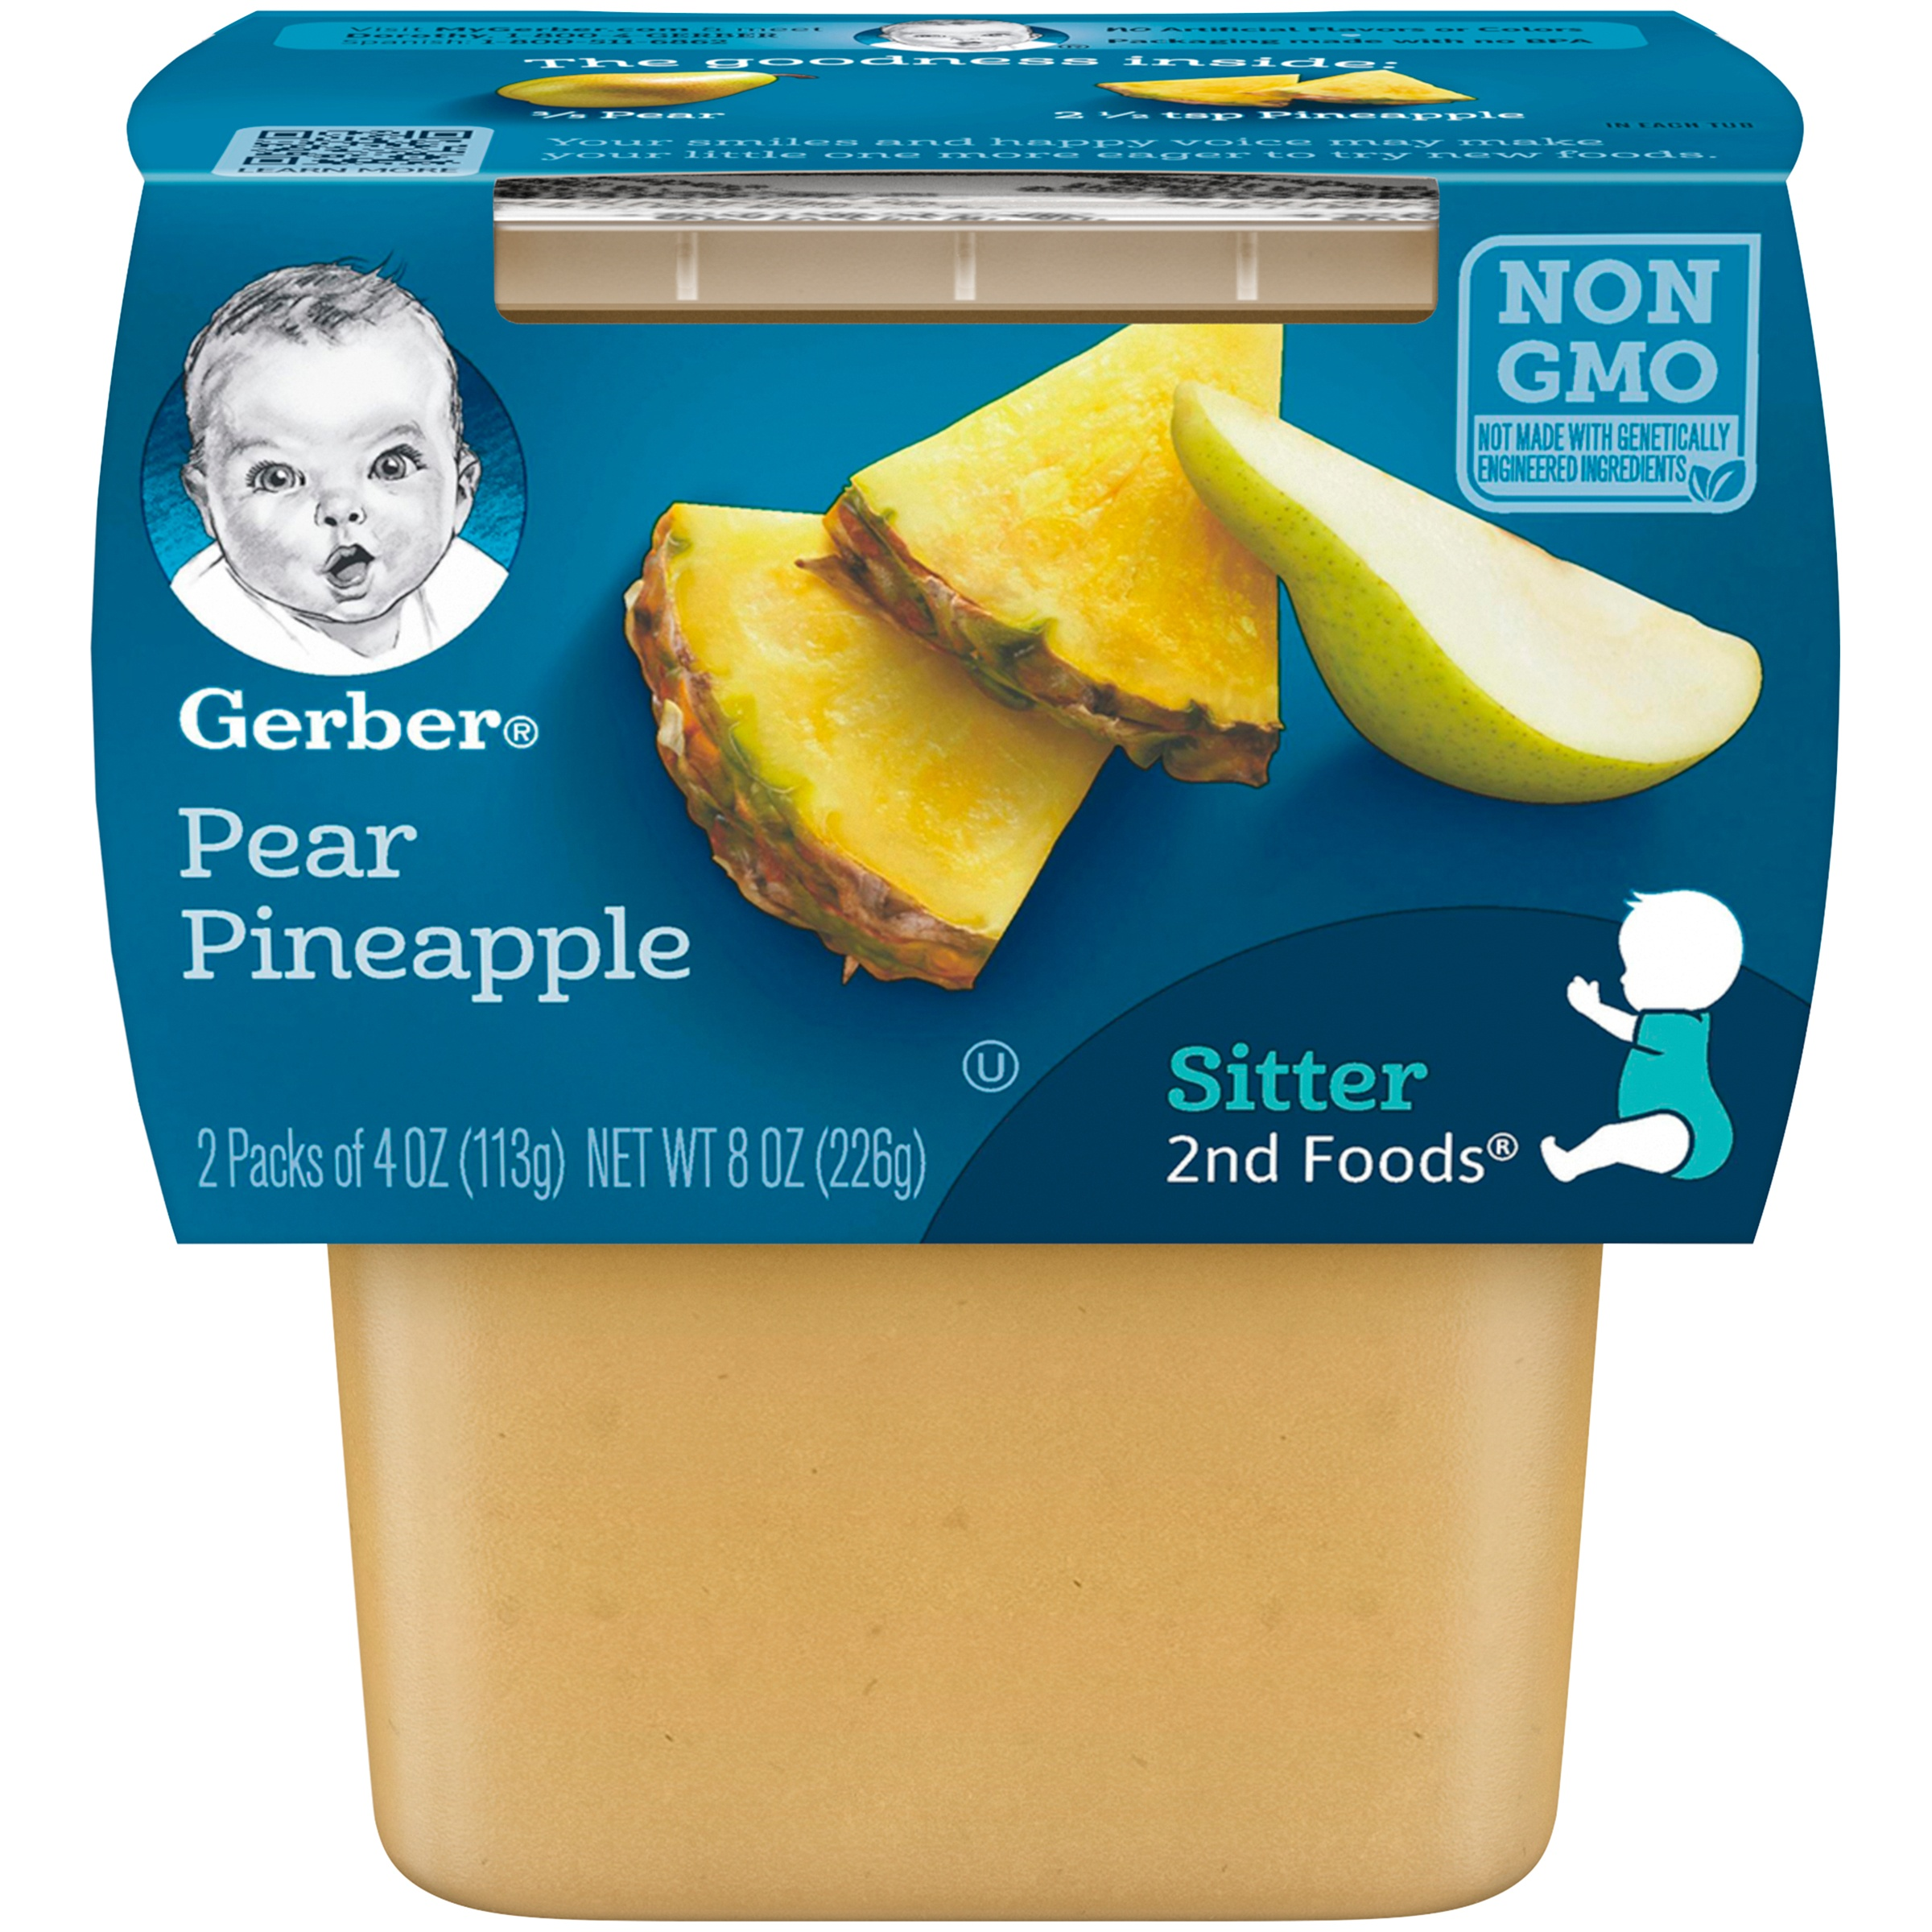 Gerber 2nd Foods Pear Pineapple Baby Food, 4 oz. Tubs, 2 Count (Pack of 8) by Gerber